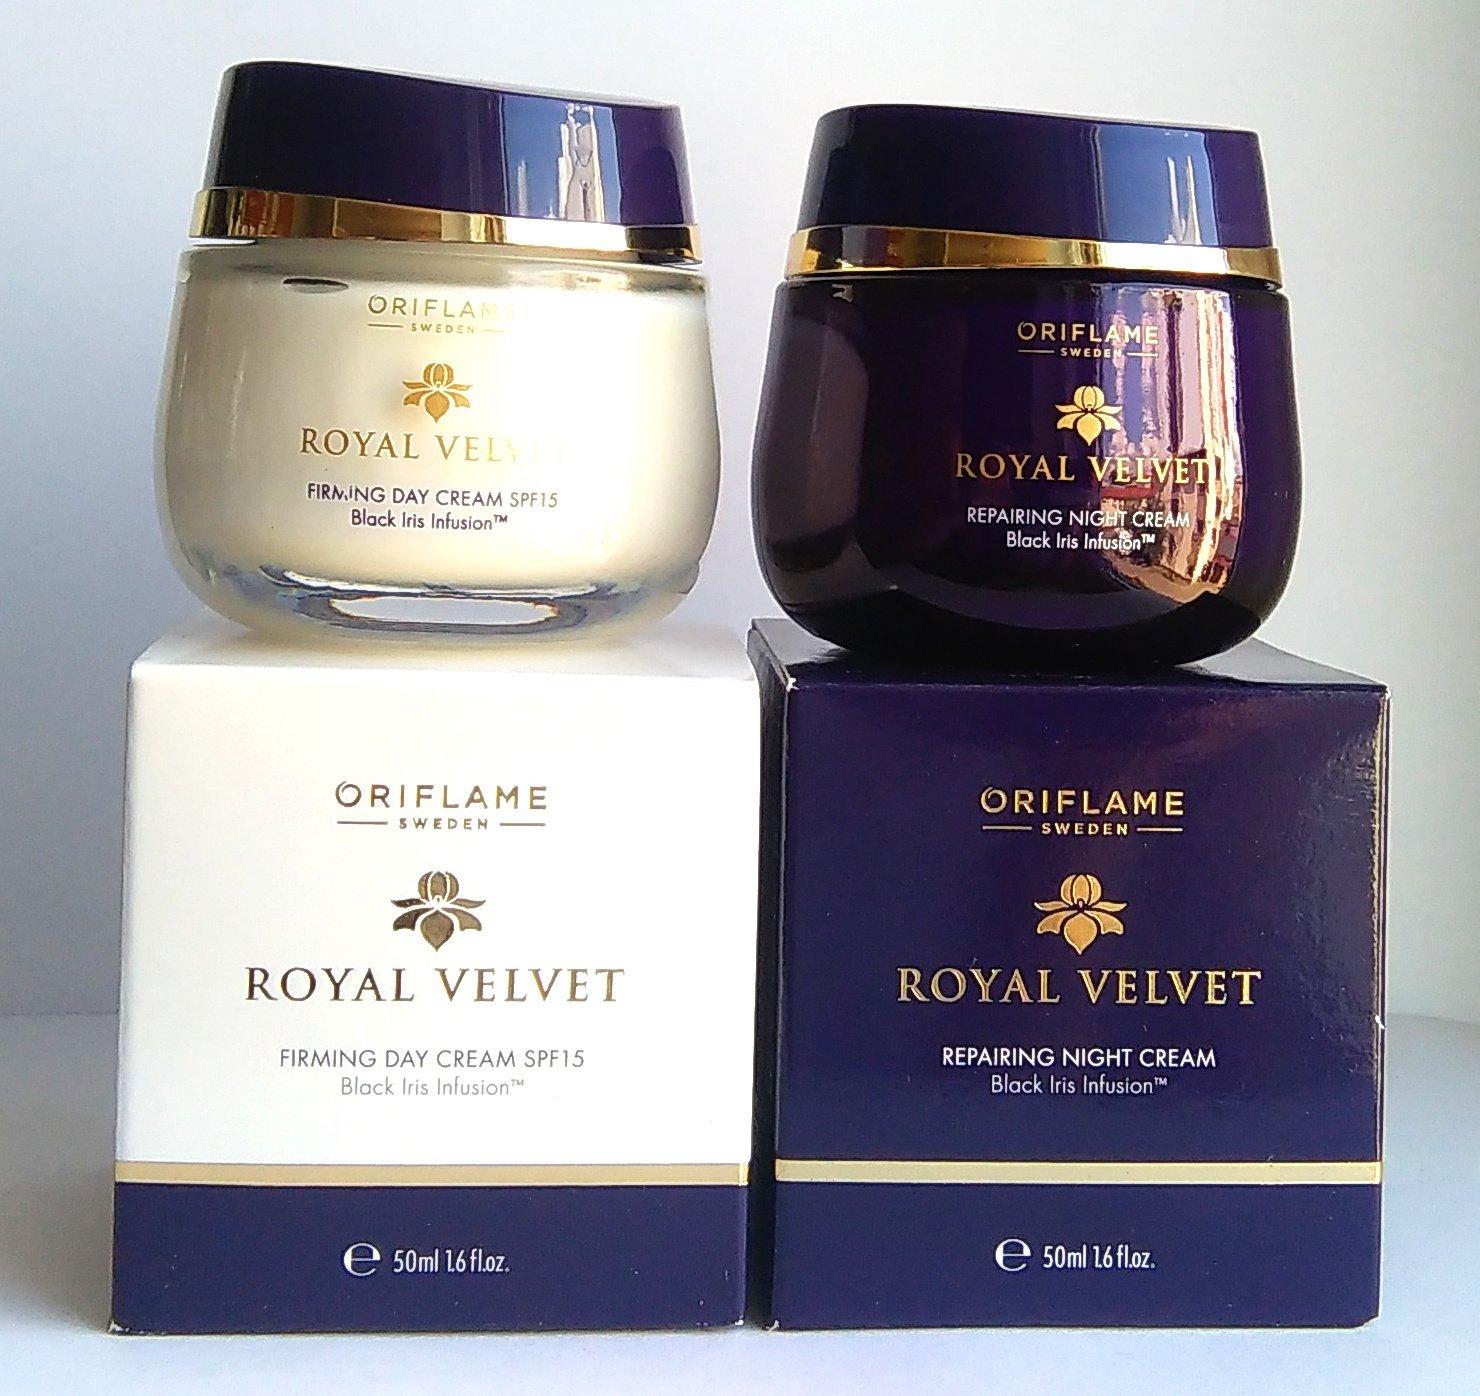 Oriflame Royal Velvet 40+ SET : Firming Day Cream SPF 15 + Repairing Night Cream by Oriflame